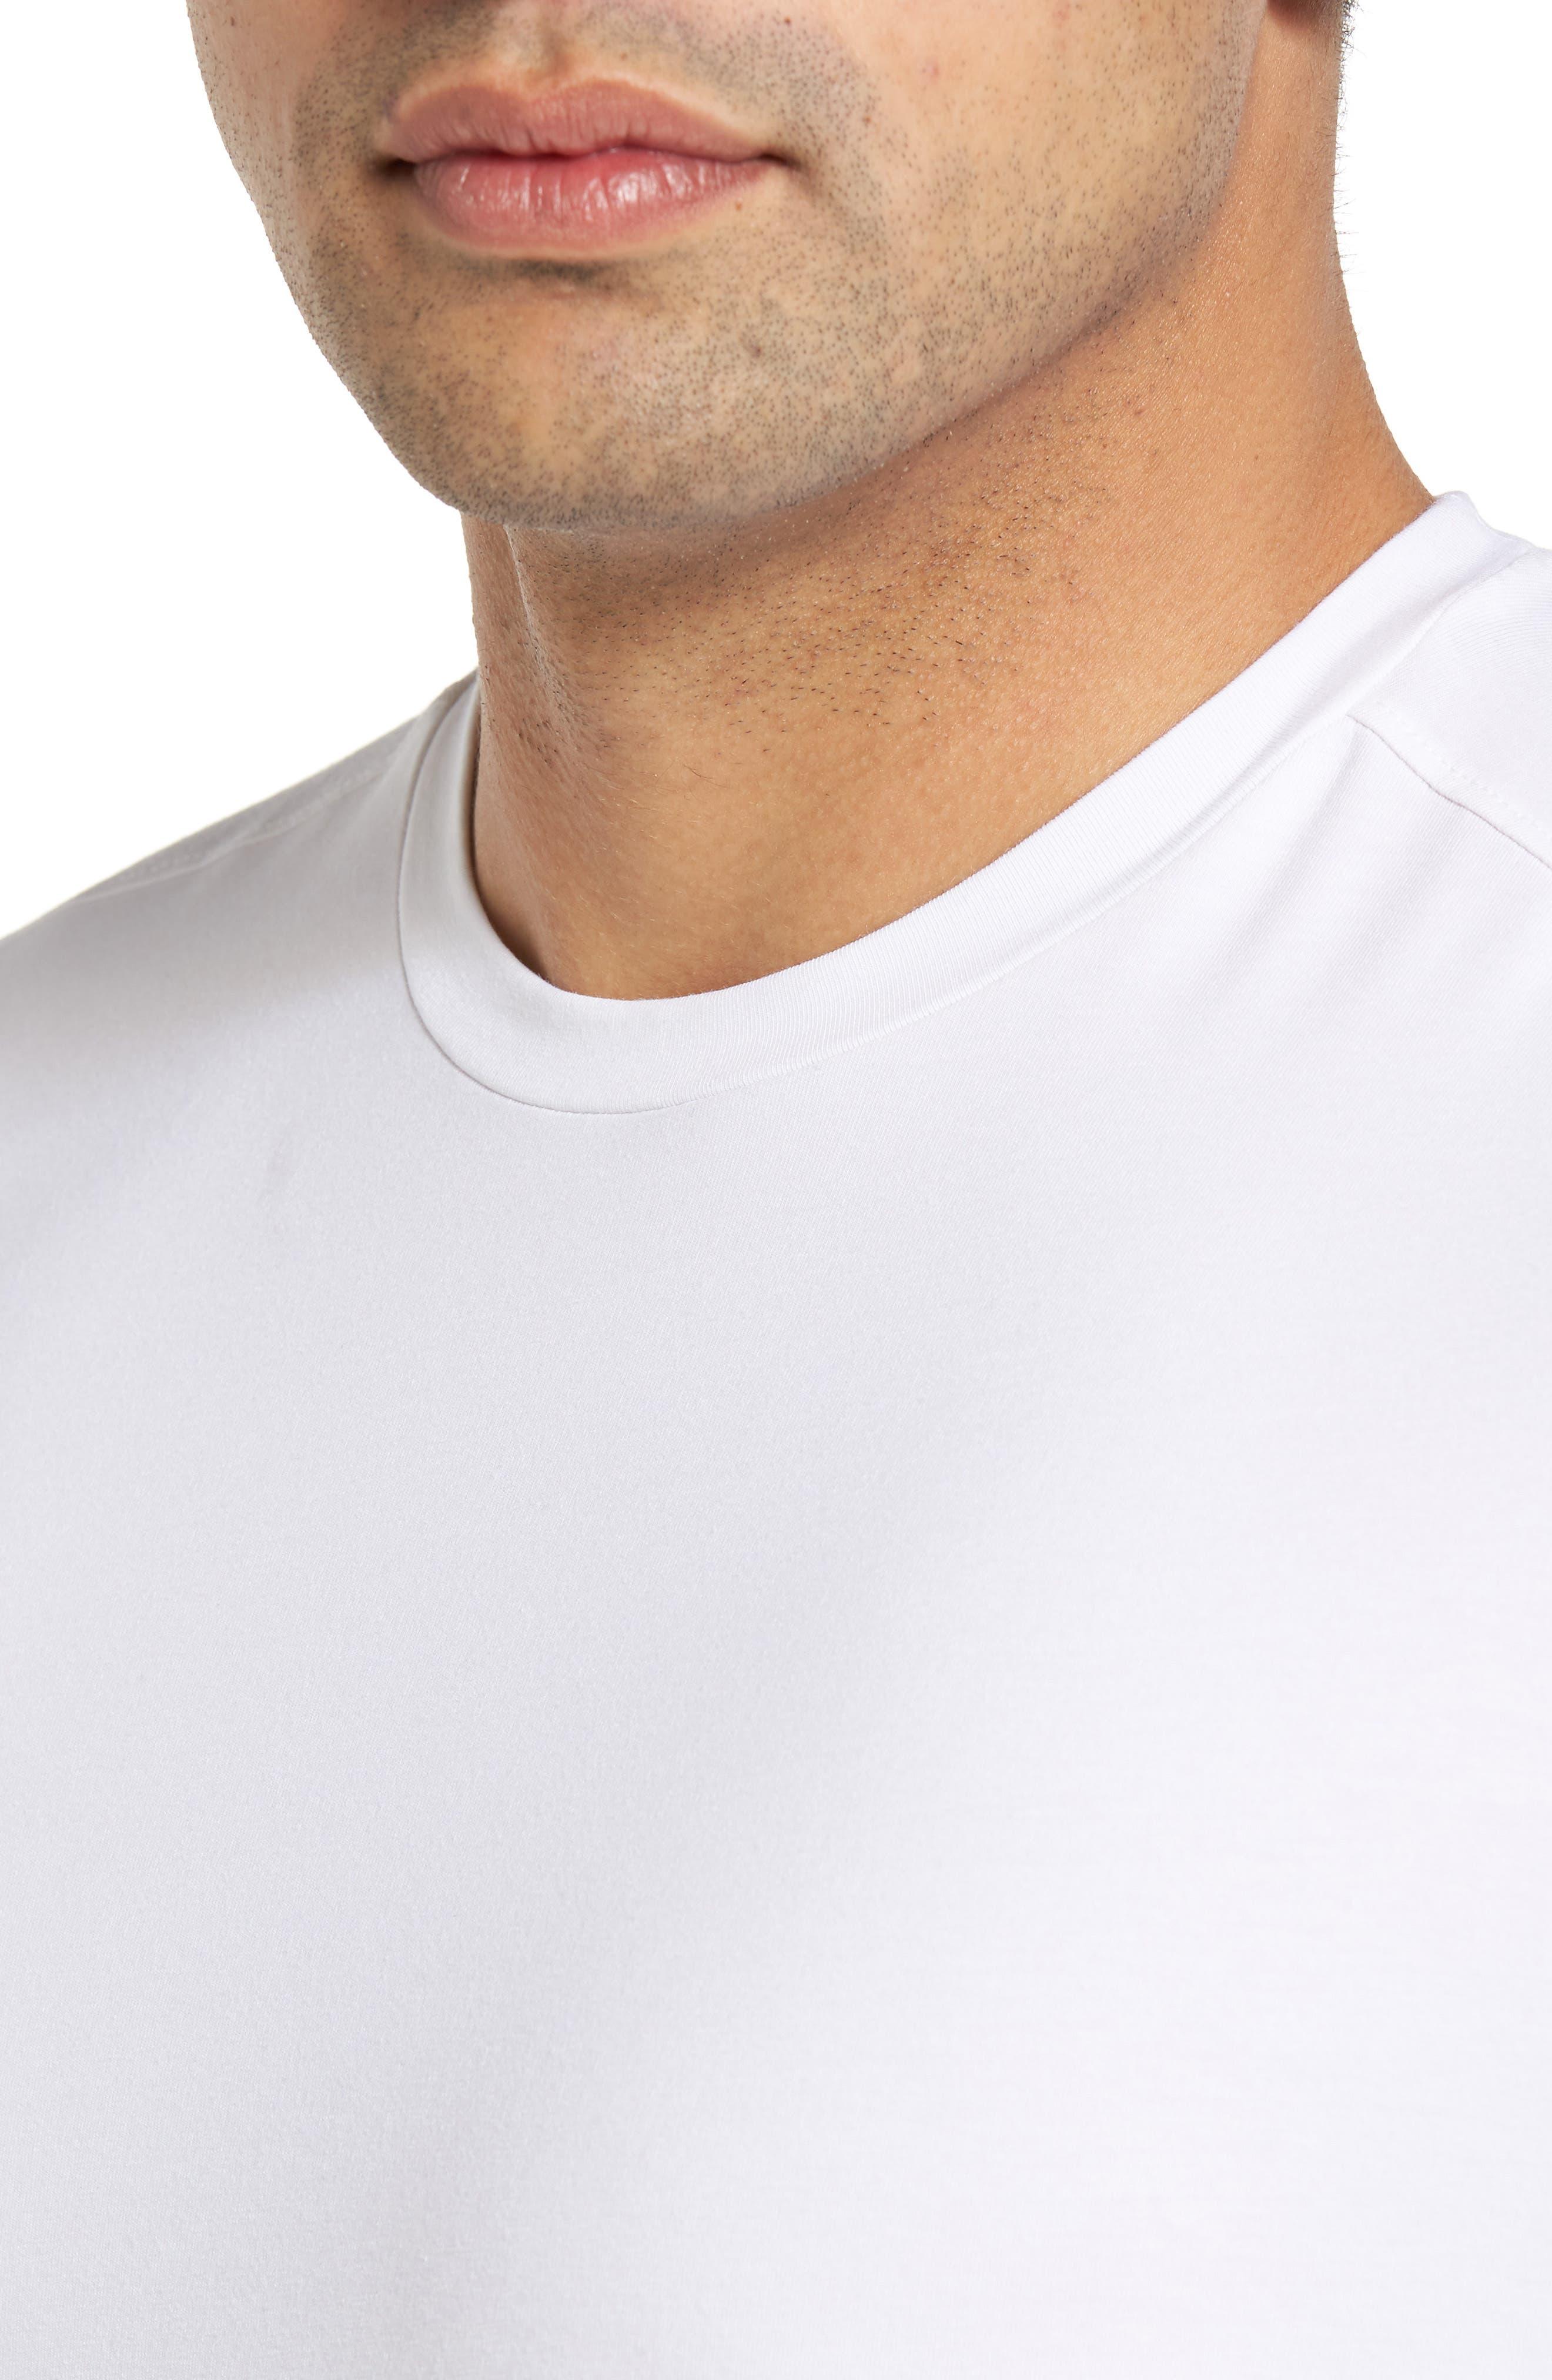 Tropicool T-Shirt,                             Alternate thumbnail 34, color,